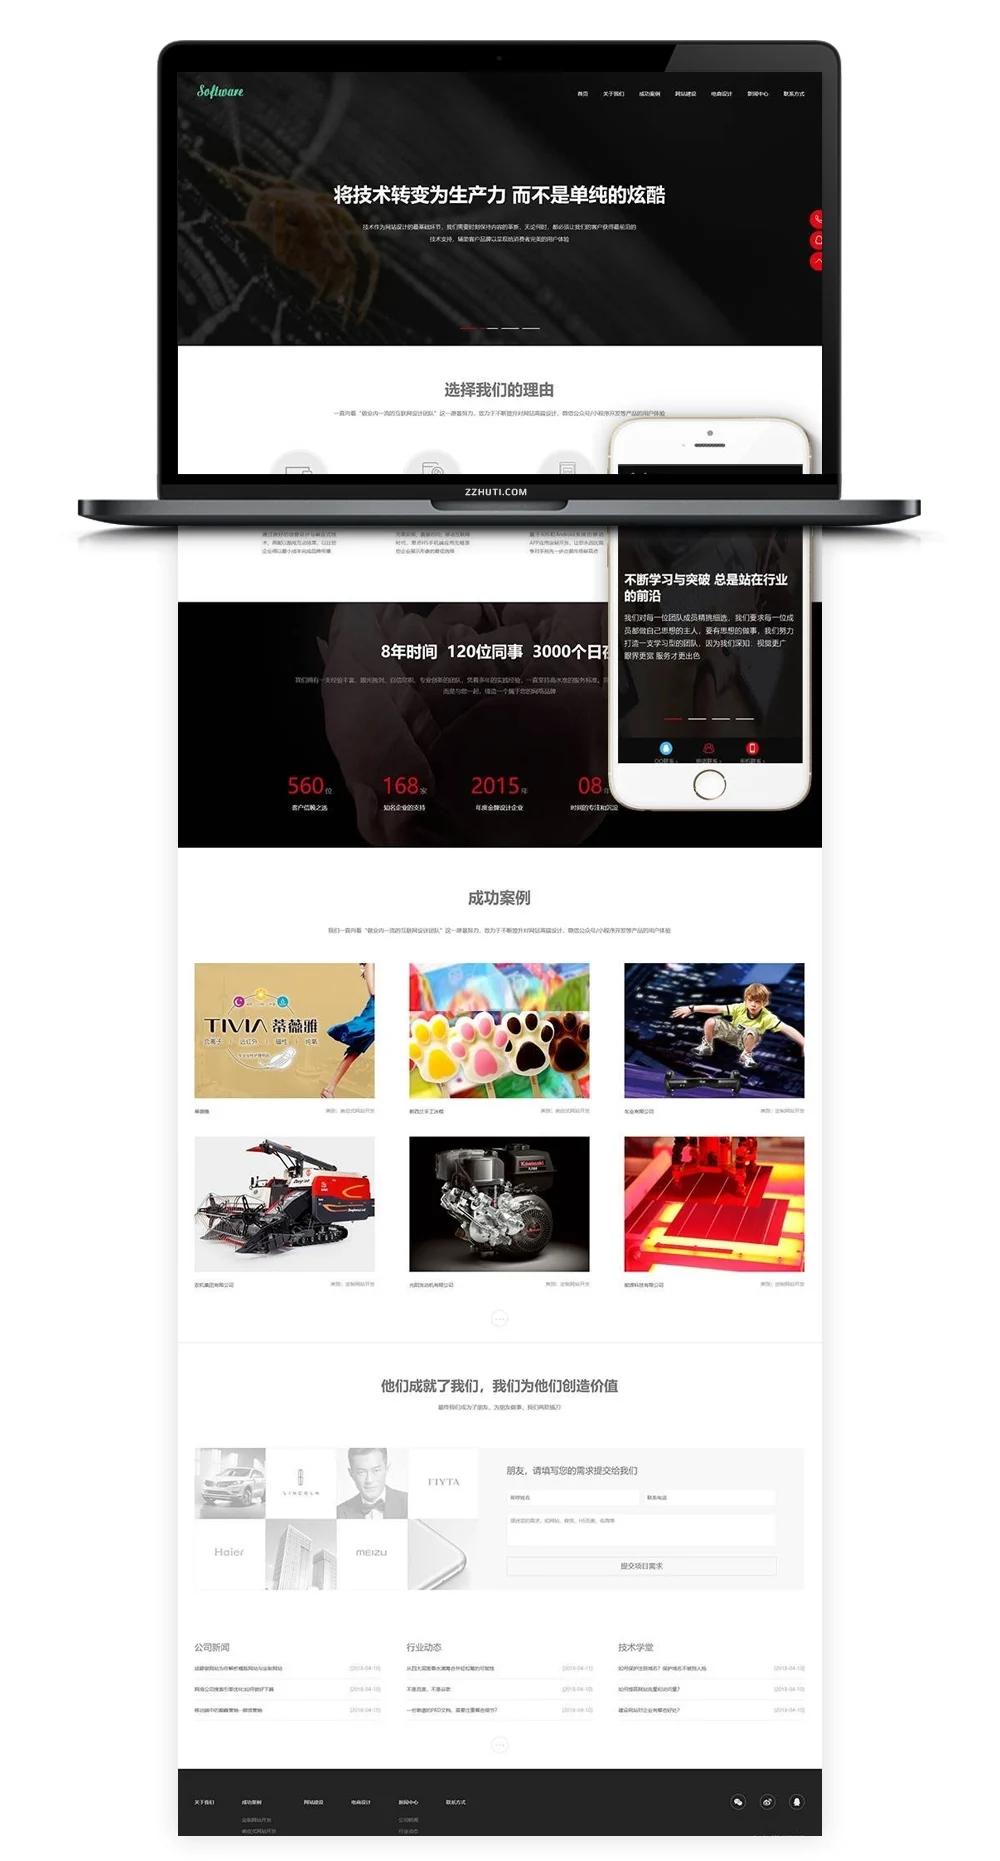 D99织梦dede模板源码网络科技公司网站模板[自适应手机版]